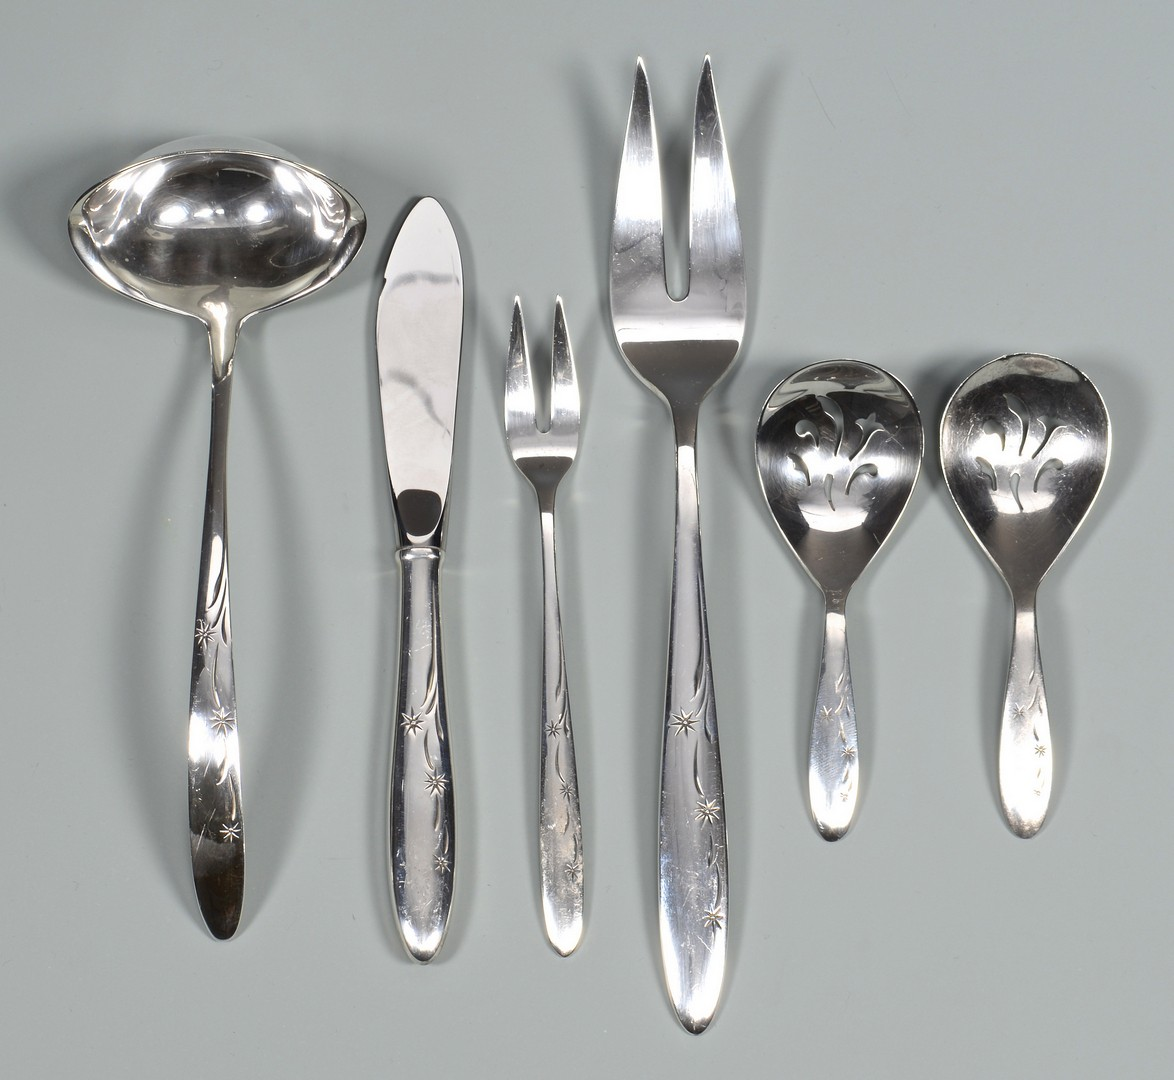 Lot 673: Gorham Celeste sterling flatware, 72 pcs, midcentury modern